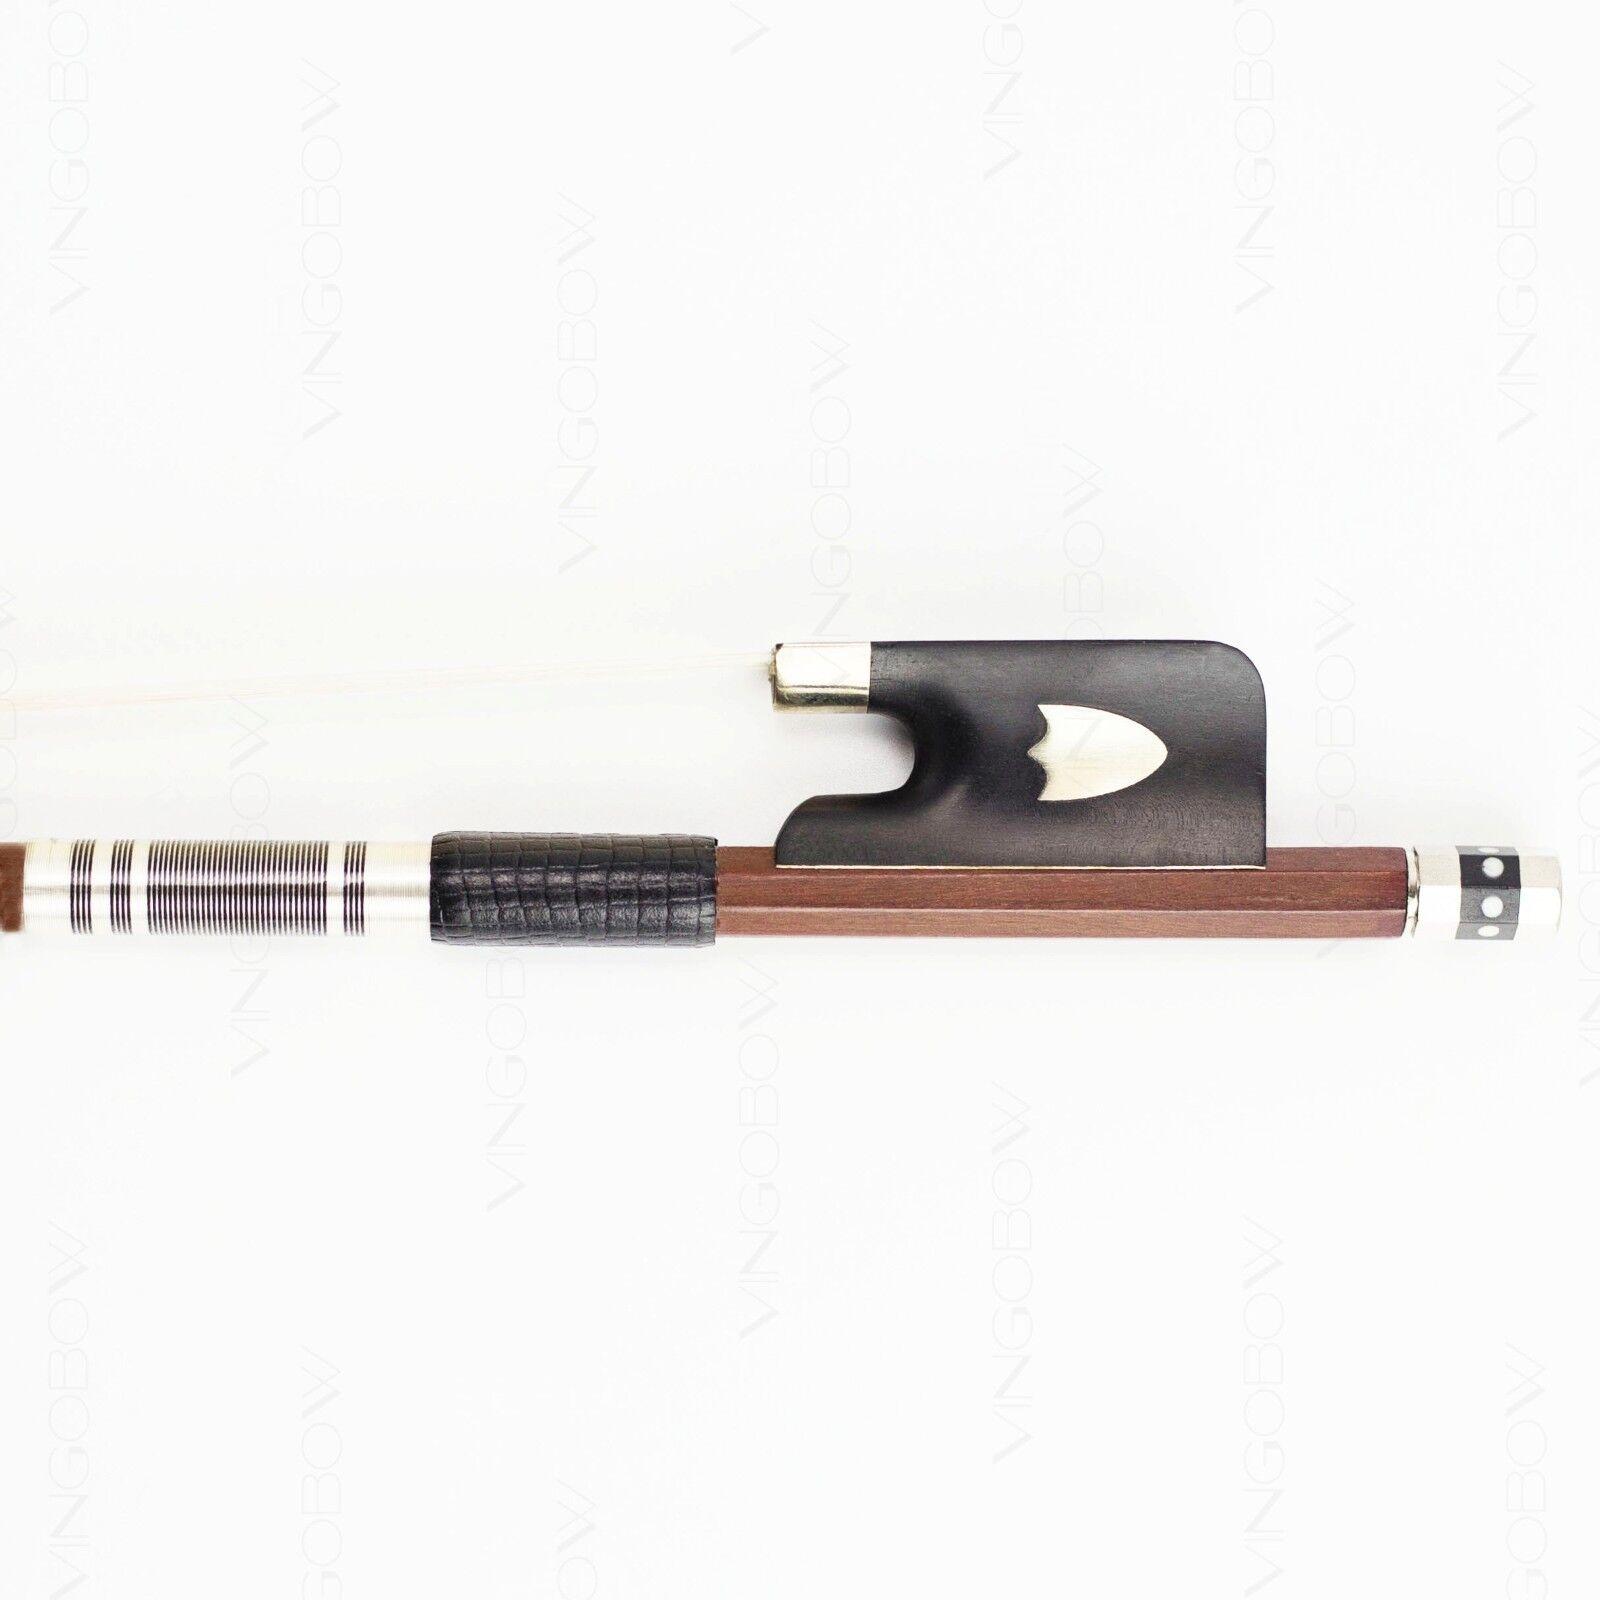 Violoncello Arco Hybrid Pernambuco Pernambuco Pernambuco Skin & Carbon Fiber Core Cello Bow  ventas en linea